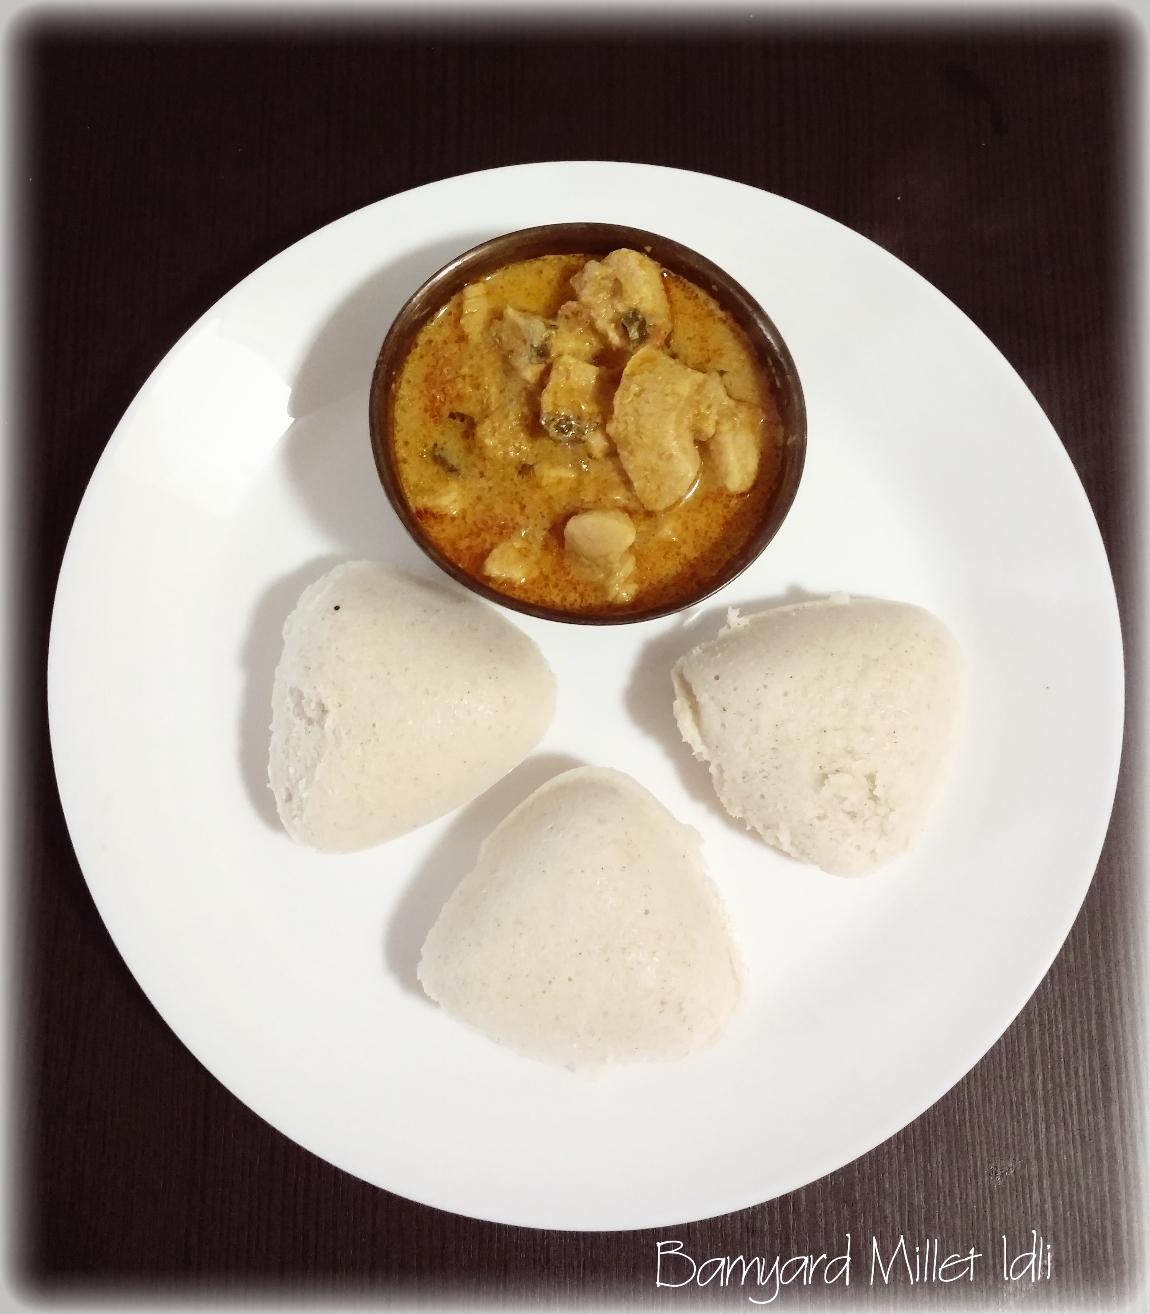 cookbabycook: Barnyard Millet Idli